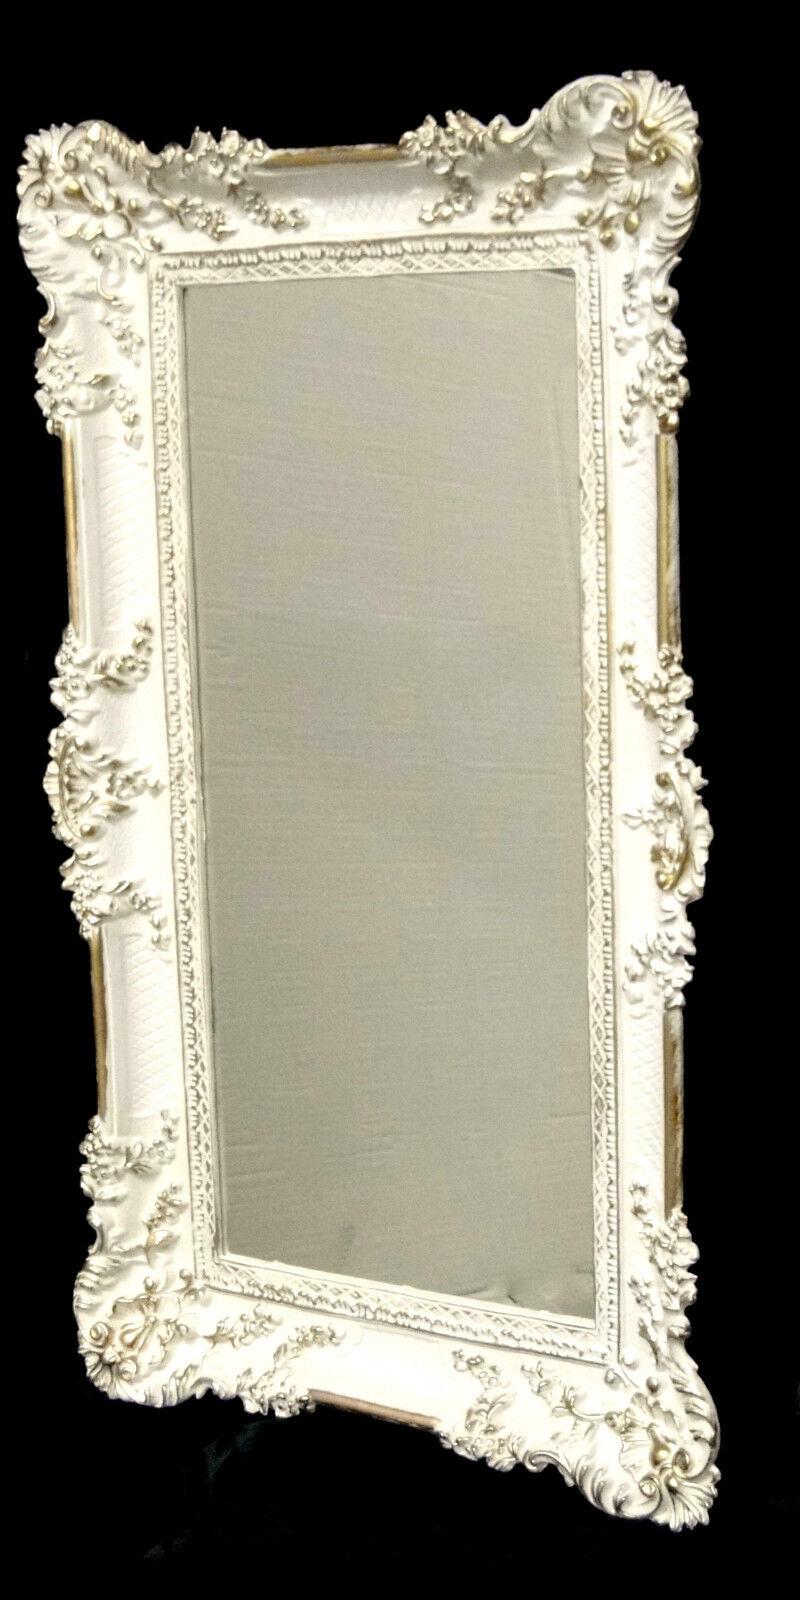 wandspiegel barock wei gold spiegel antik 96x57 mit ornamenten badspiegel 206 eur 84 90. Black Bedroom Furniture Sets. Home Design Ideas